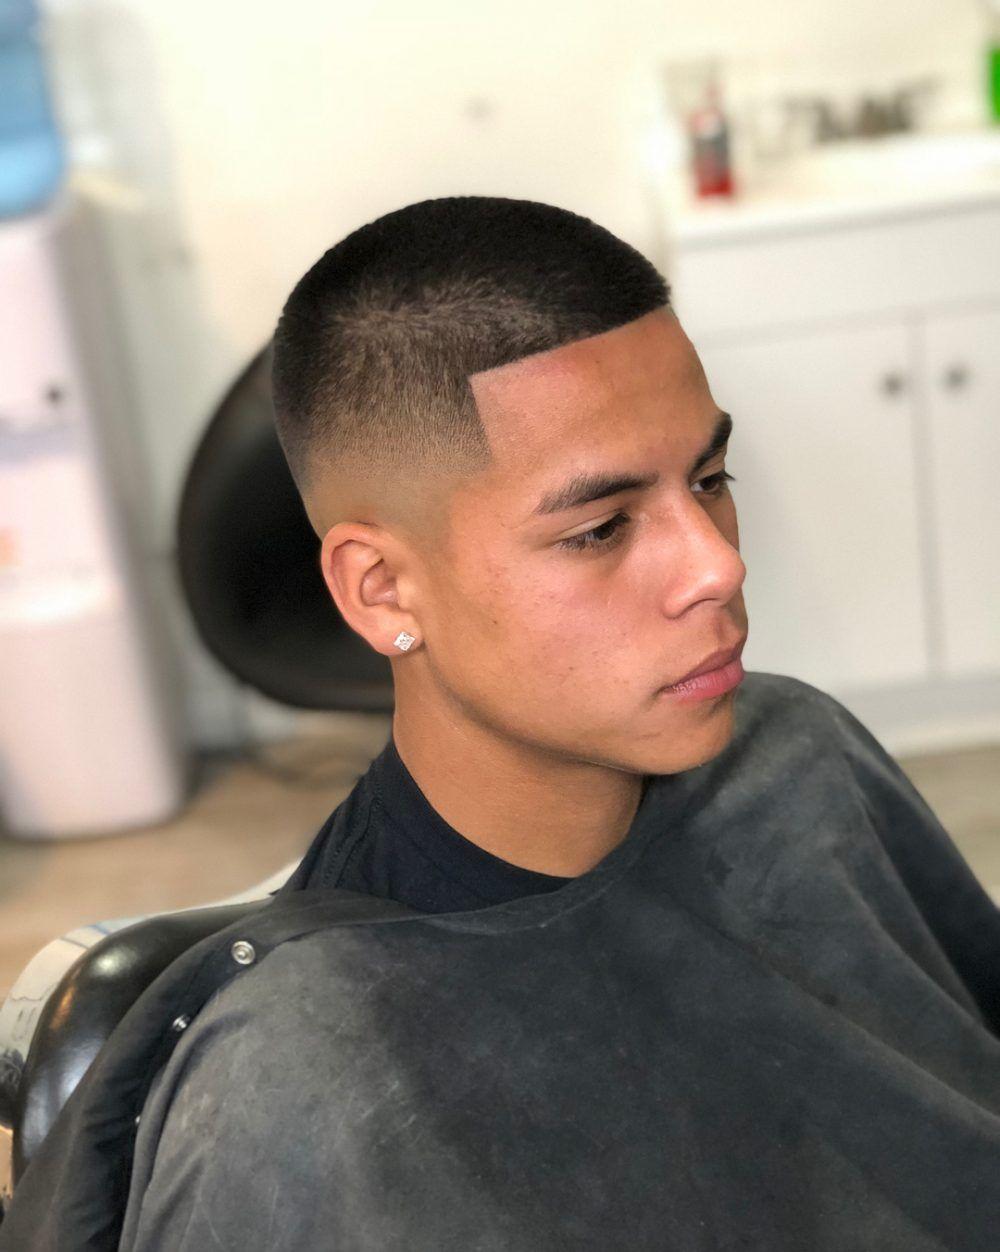 50+ Hispanic short hairstyles ideas in 2021